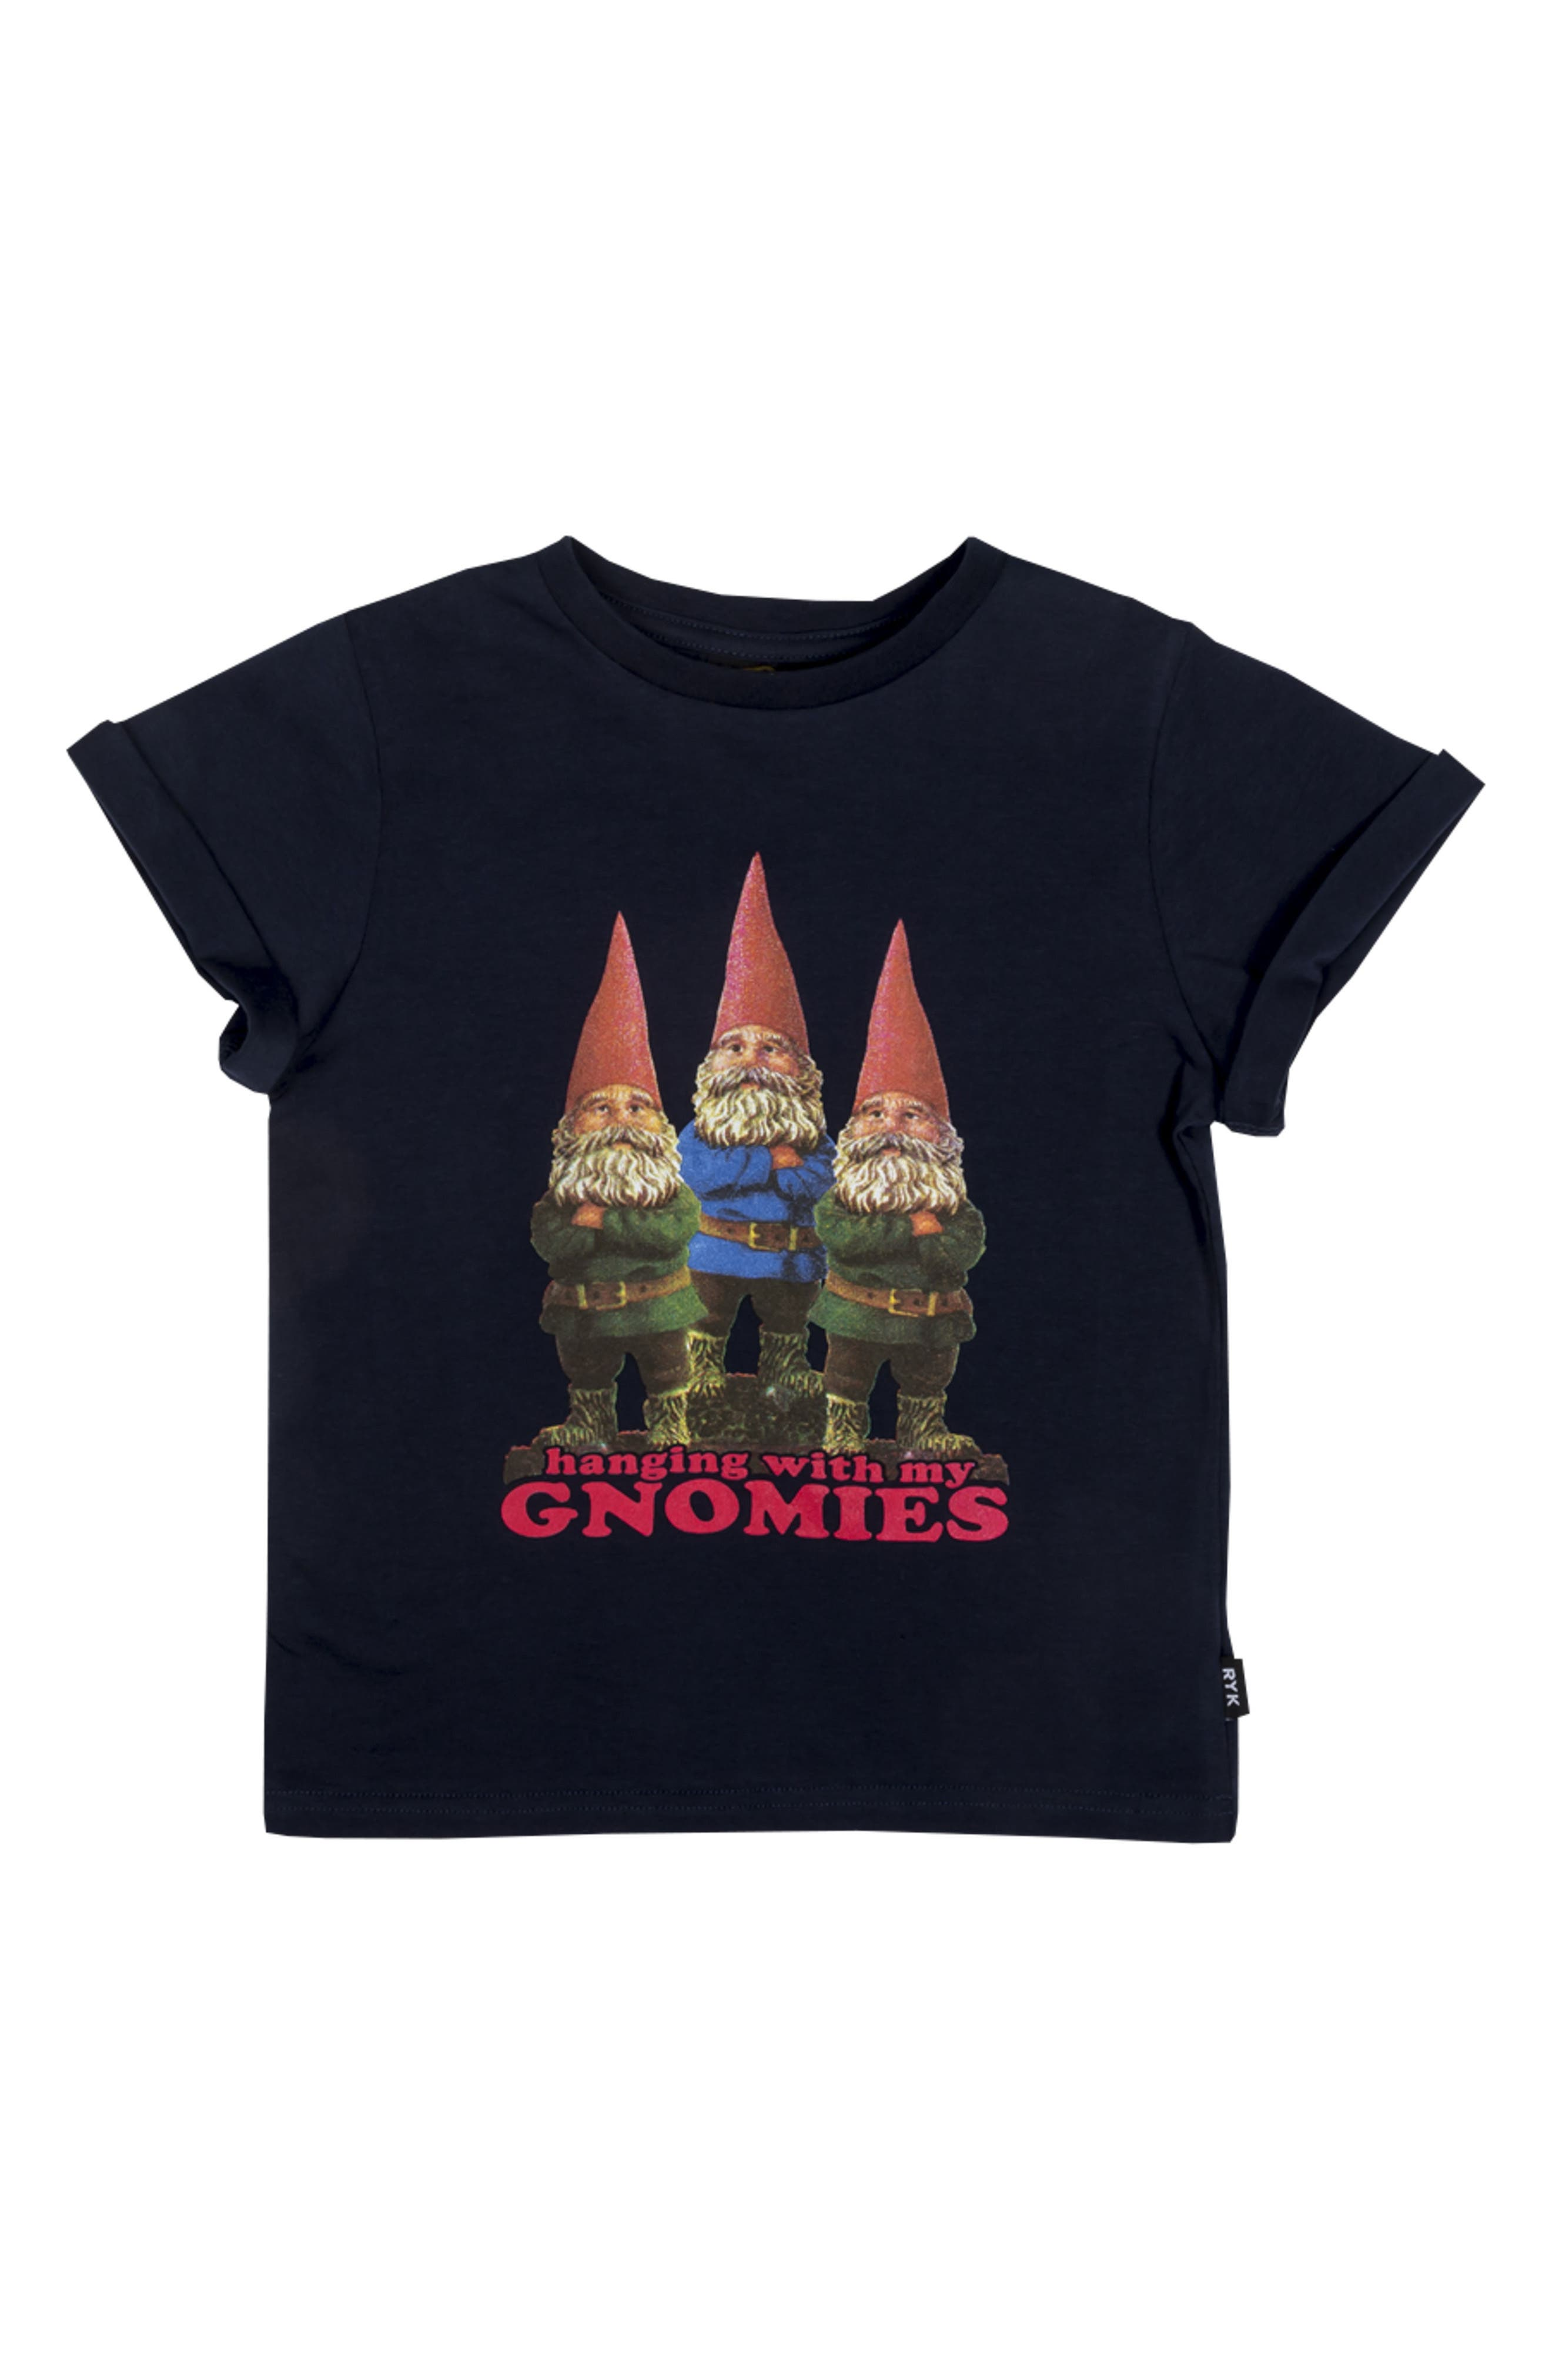 Gnomies Graphic T-Shirt,                             Main thumbnail 1, color,                             Navy